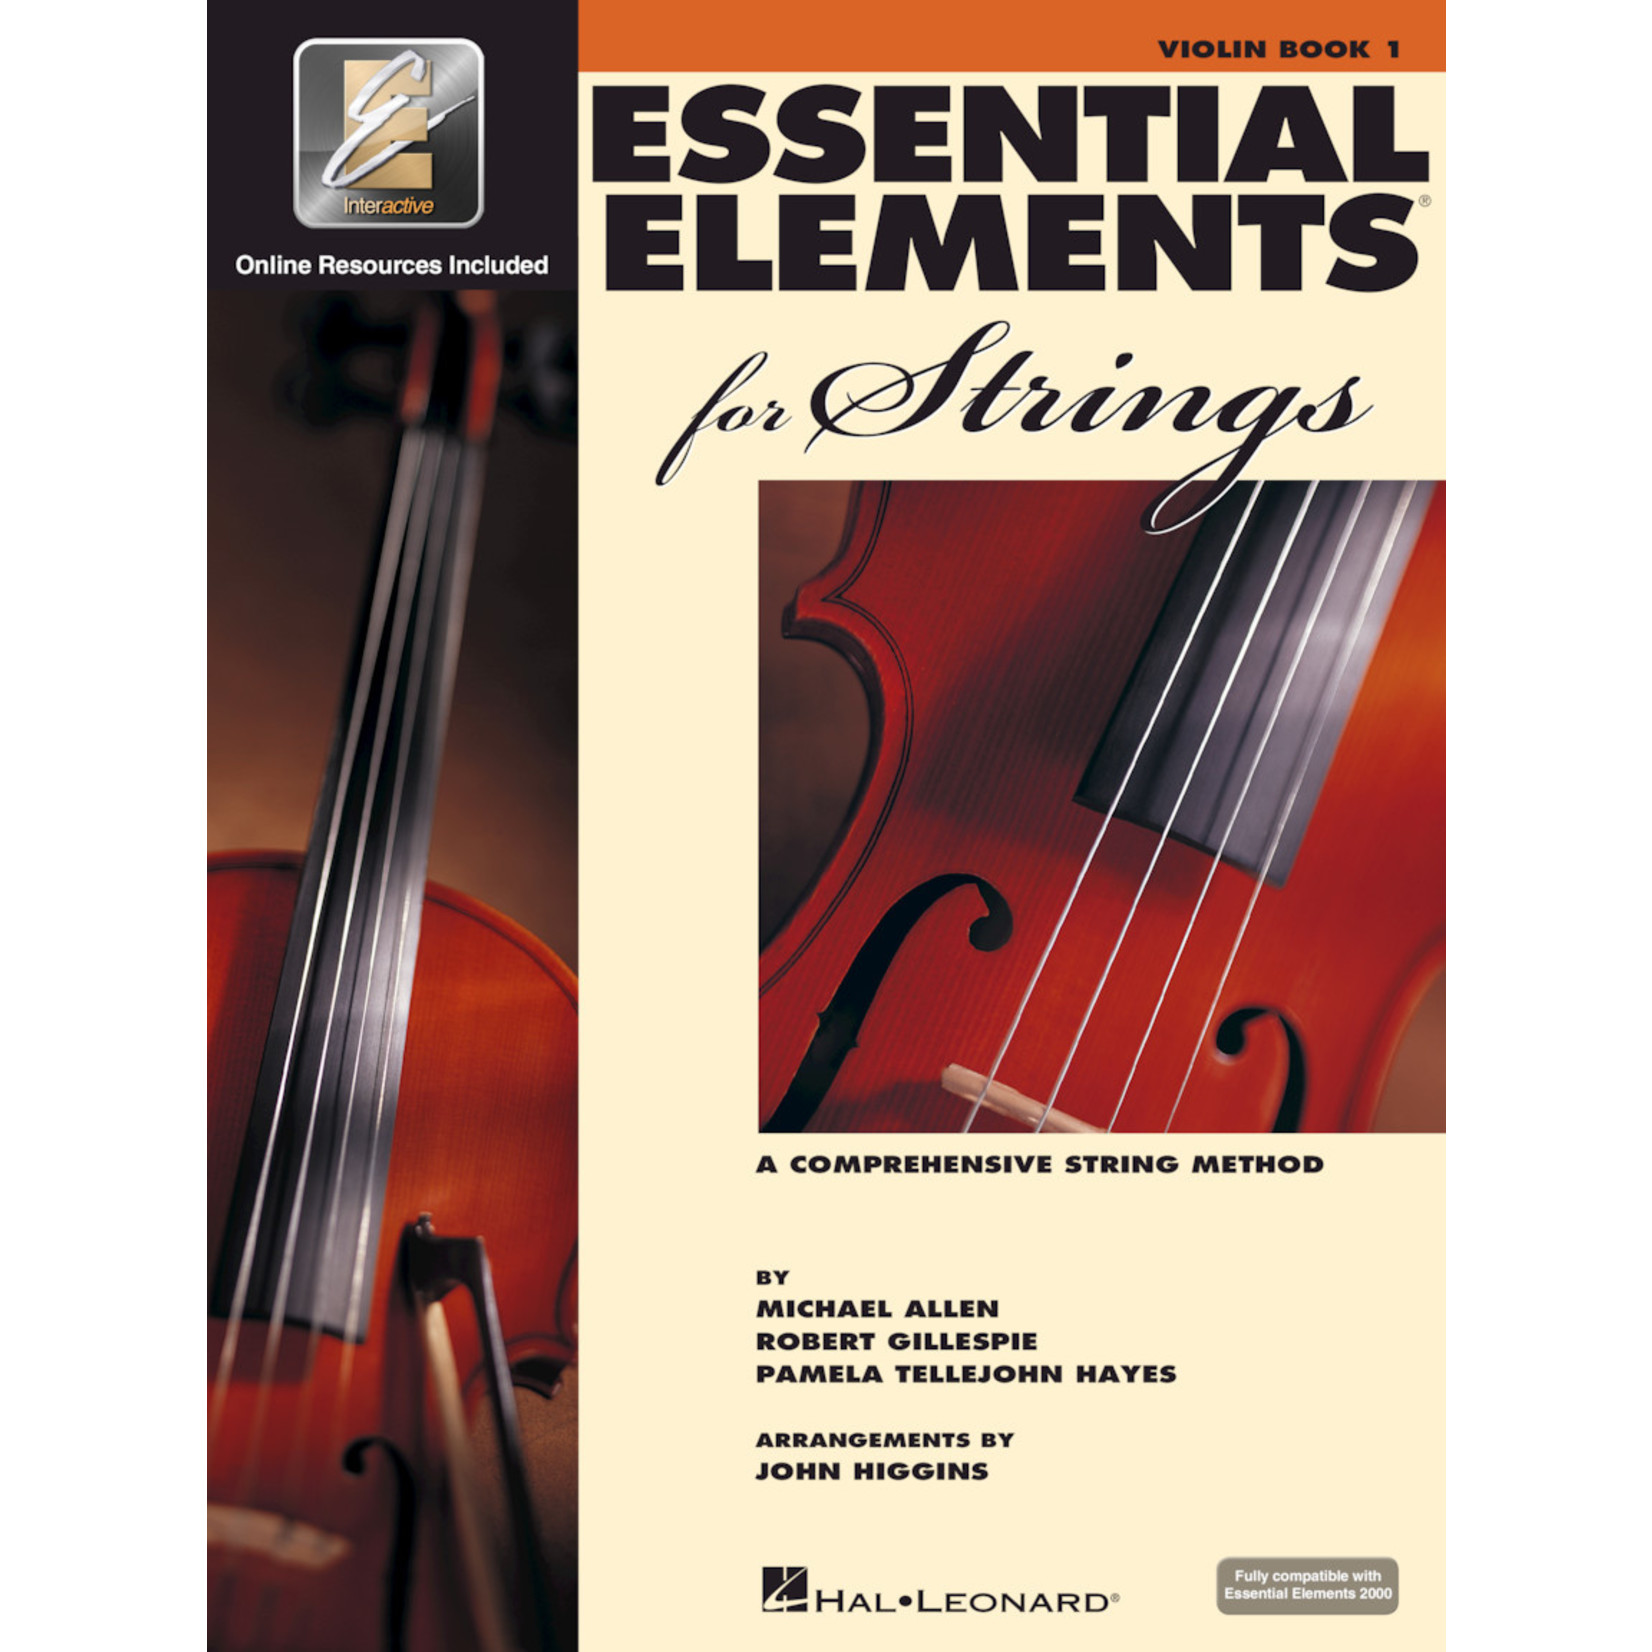 Hal Leonard Essential Elements for Strings Violin Book 1